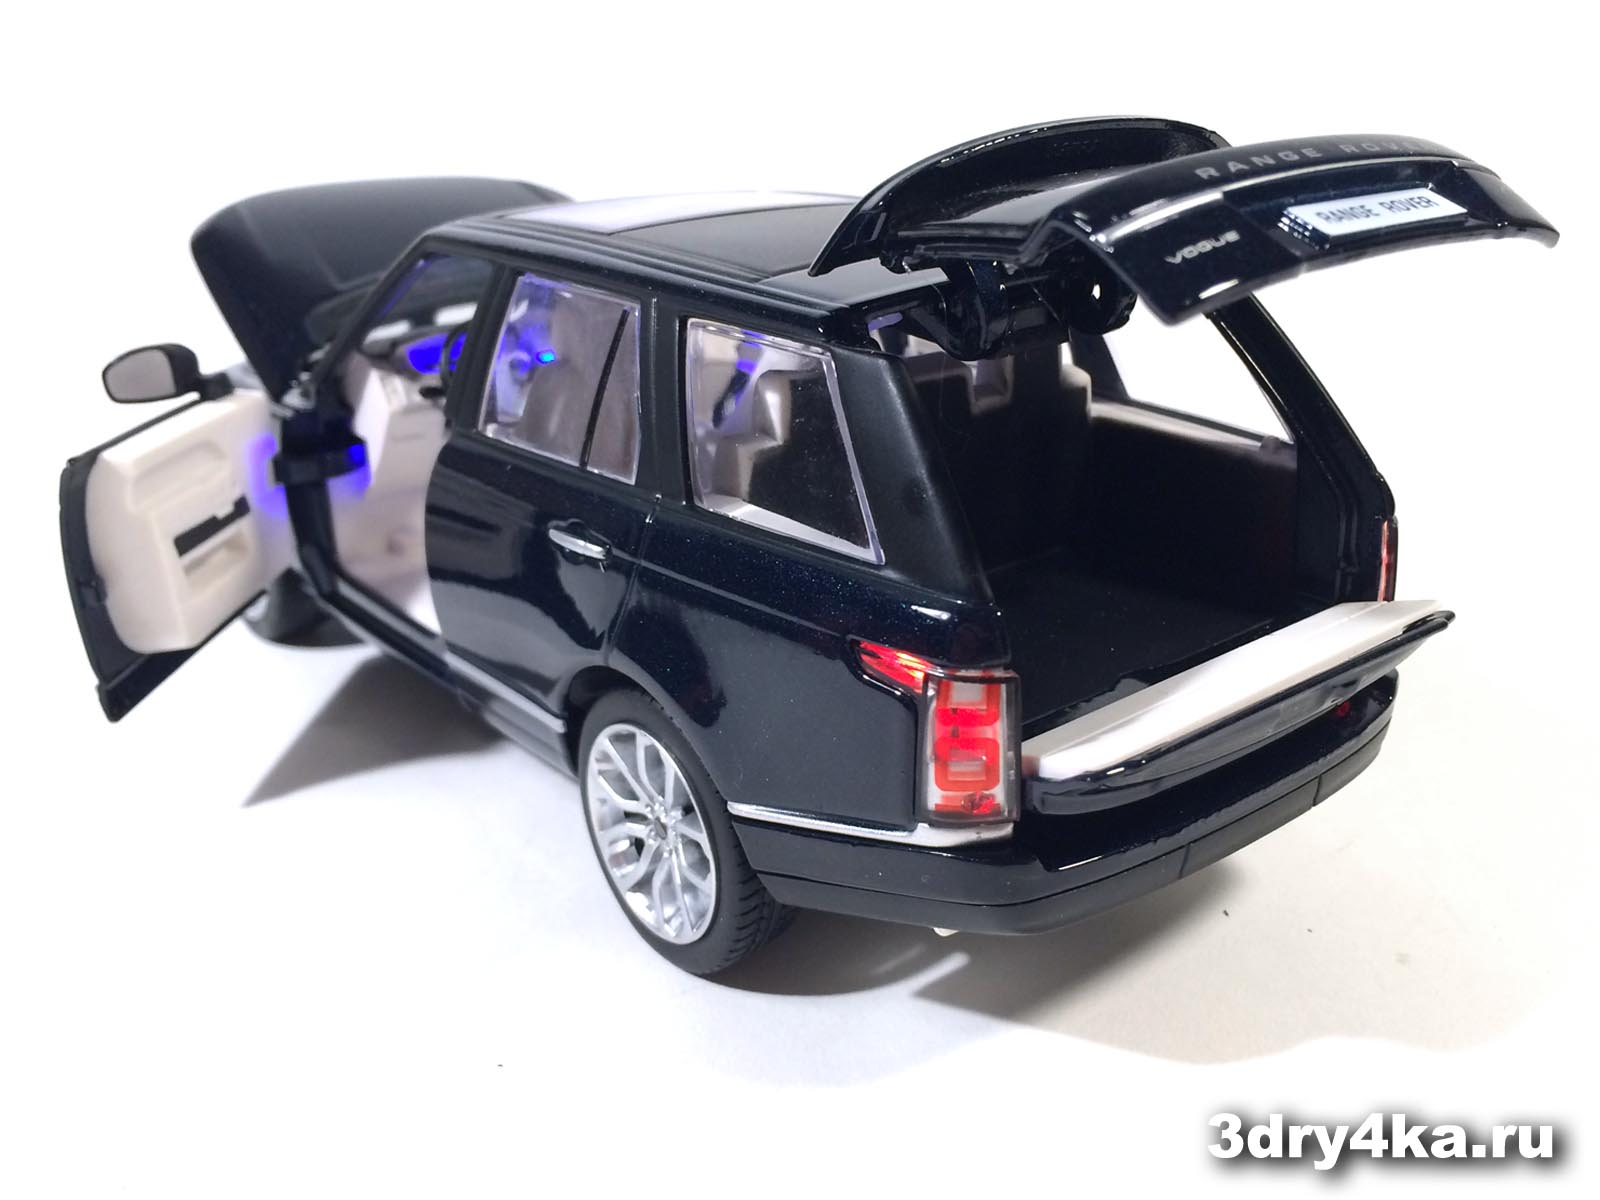 масштабная модель Land Rover Range Rover Voque темная ночь вид сзади IDEAL  (масштаб 1:24)